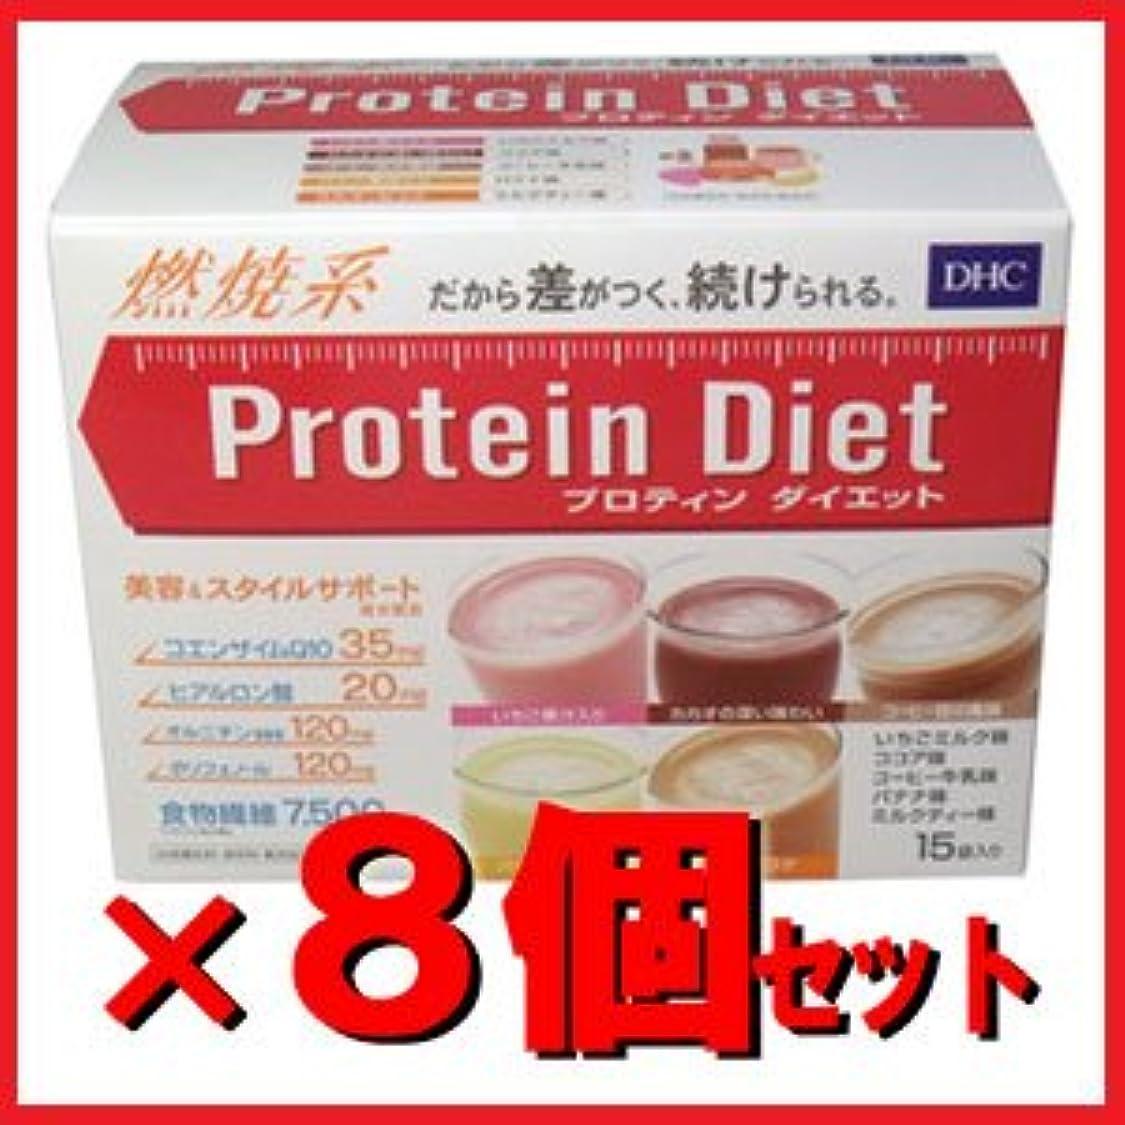 DHC プロティンダイエット 15袋入 × 8箱セット [ヘルスケア&ケア用品]